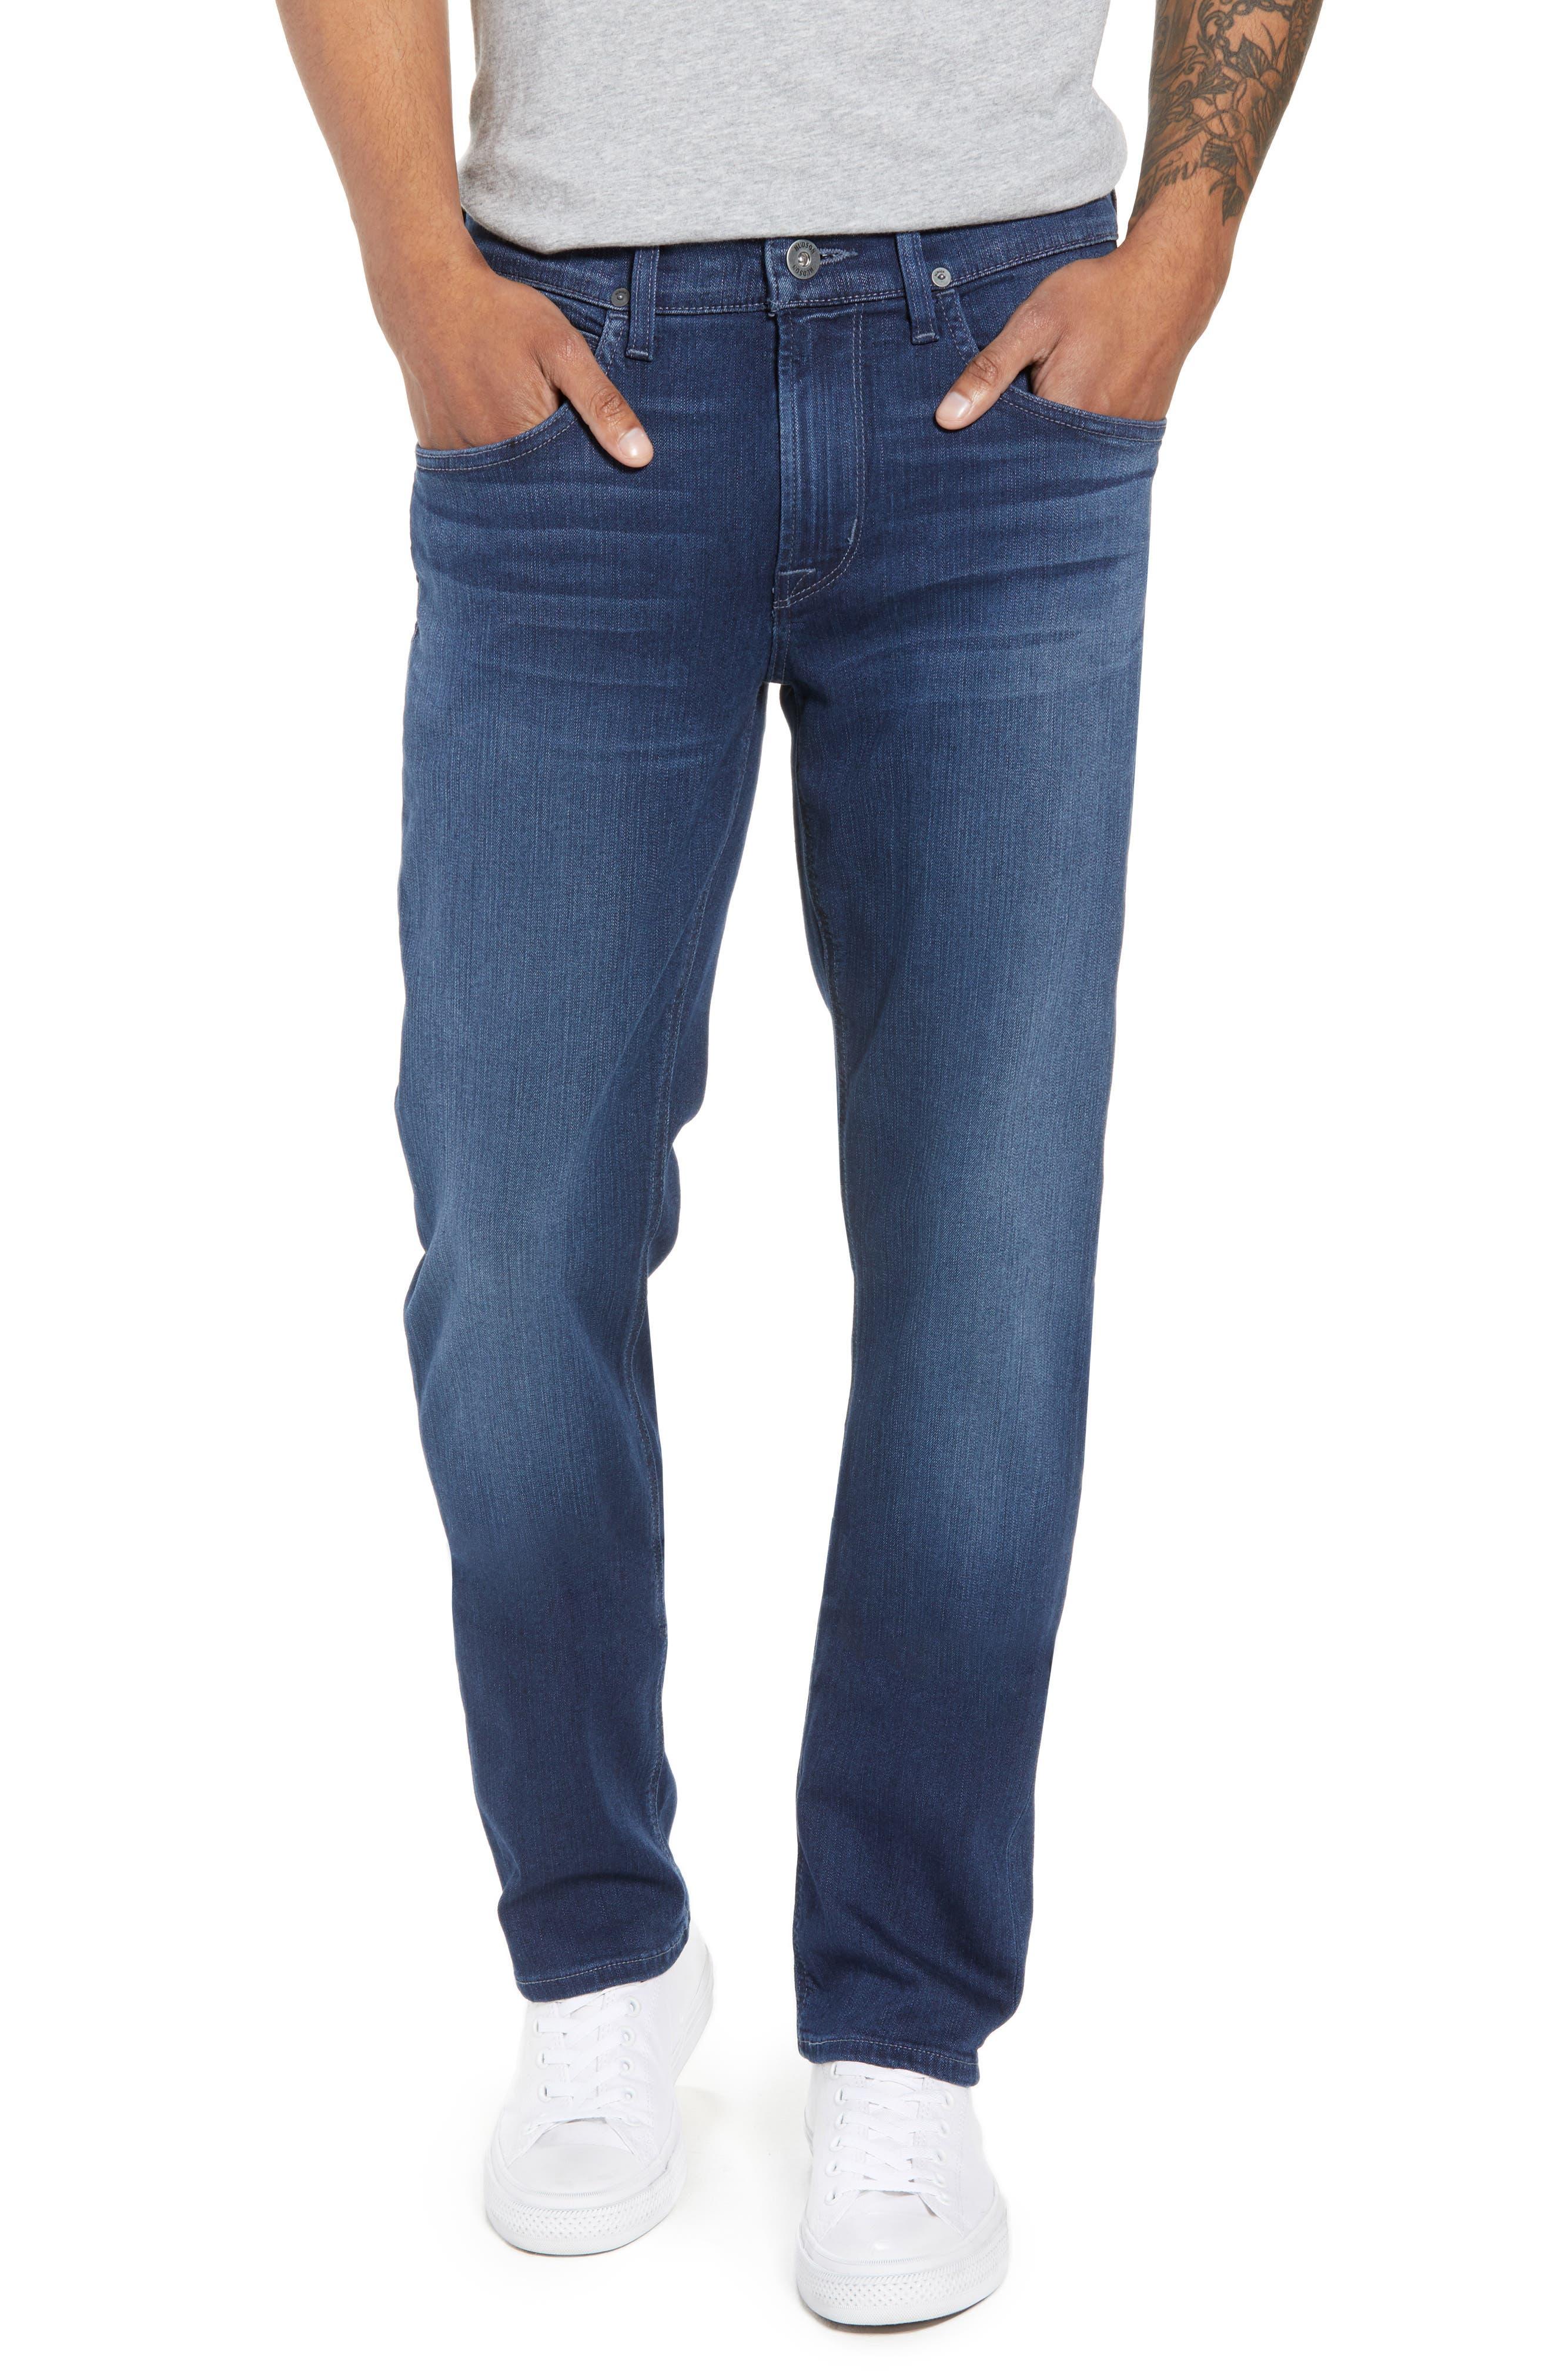 Byron Slim Straight Leg Jeans,                         Main,                         color, 403